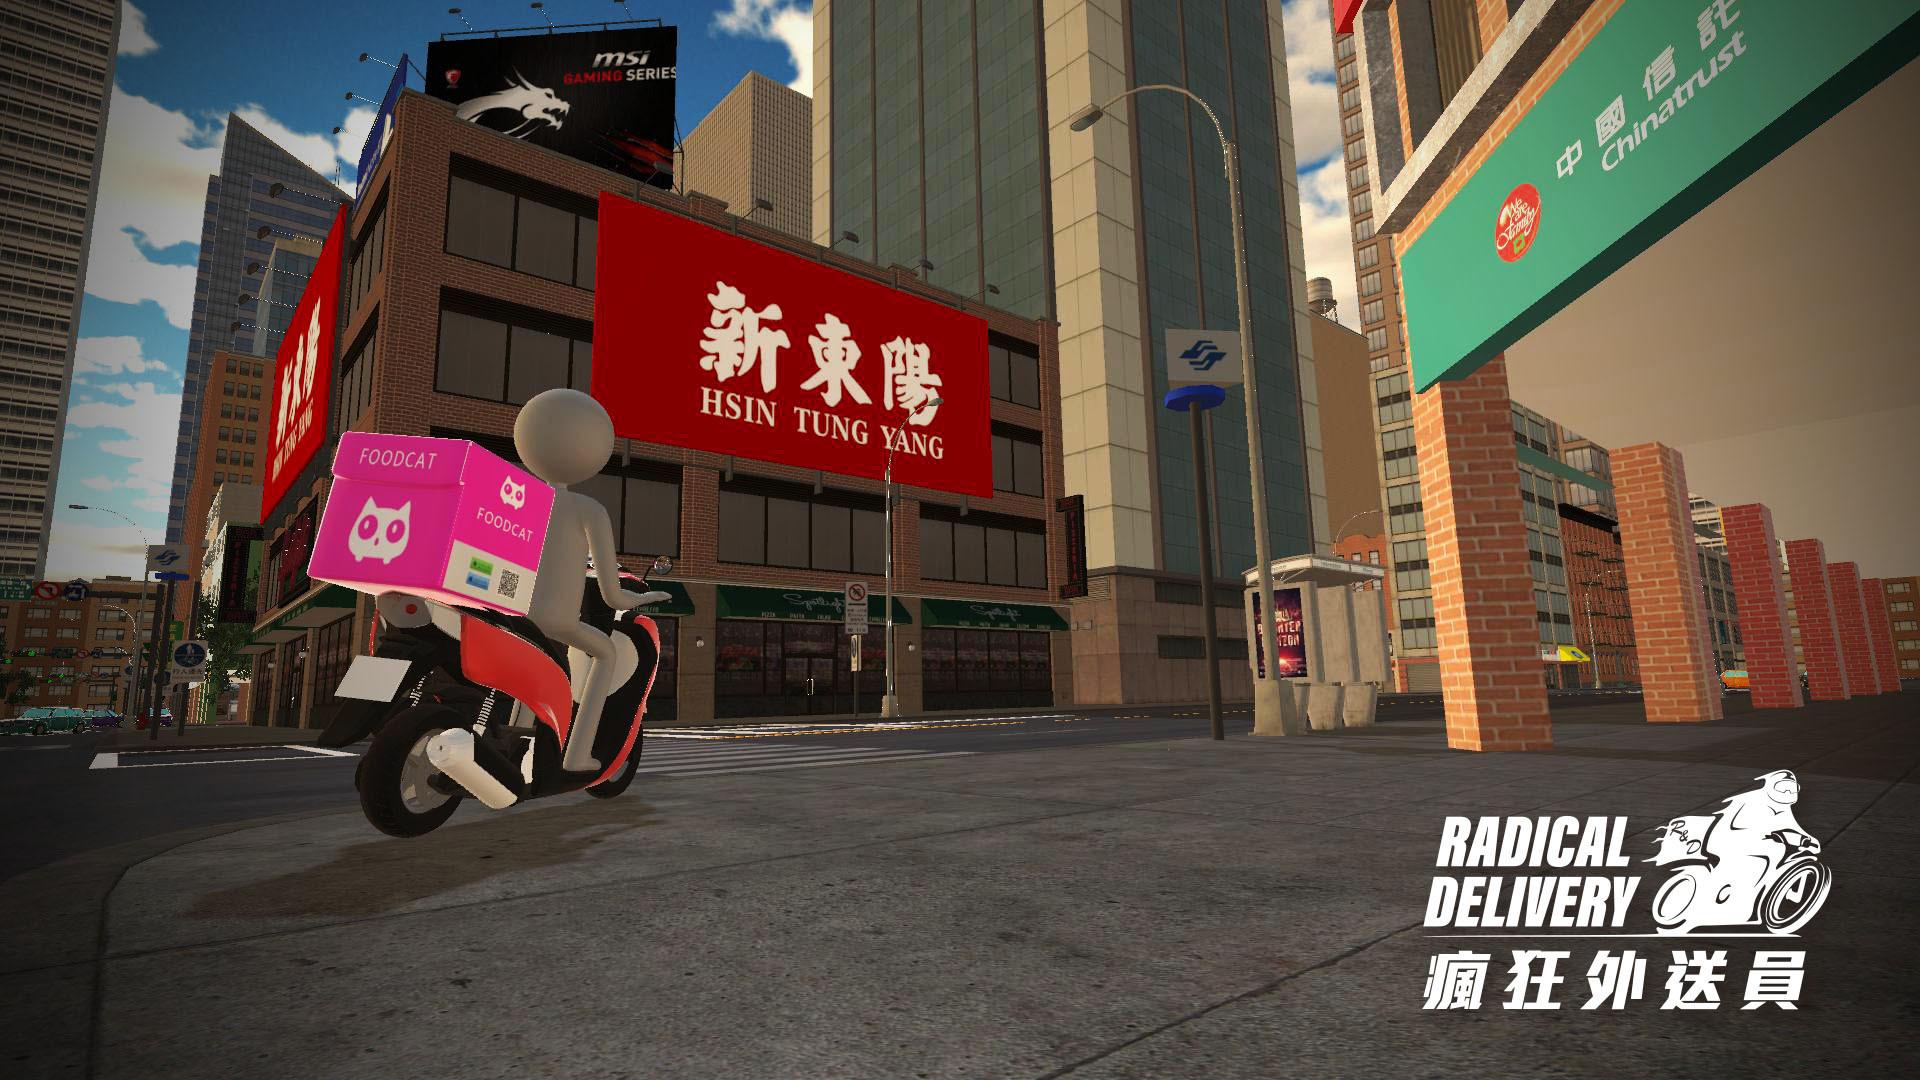 Kimage_0008A1.jpg